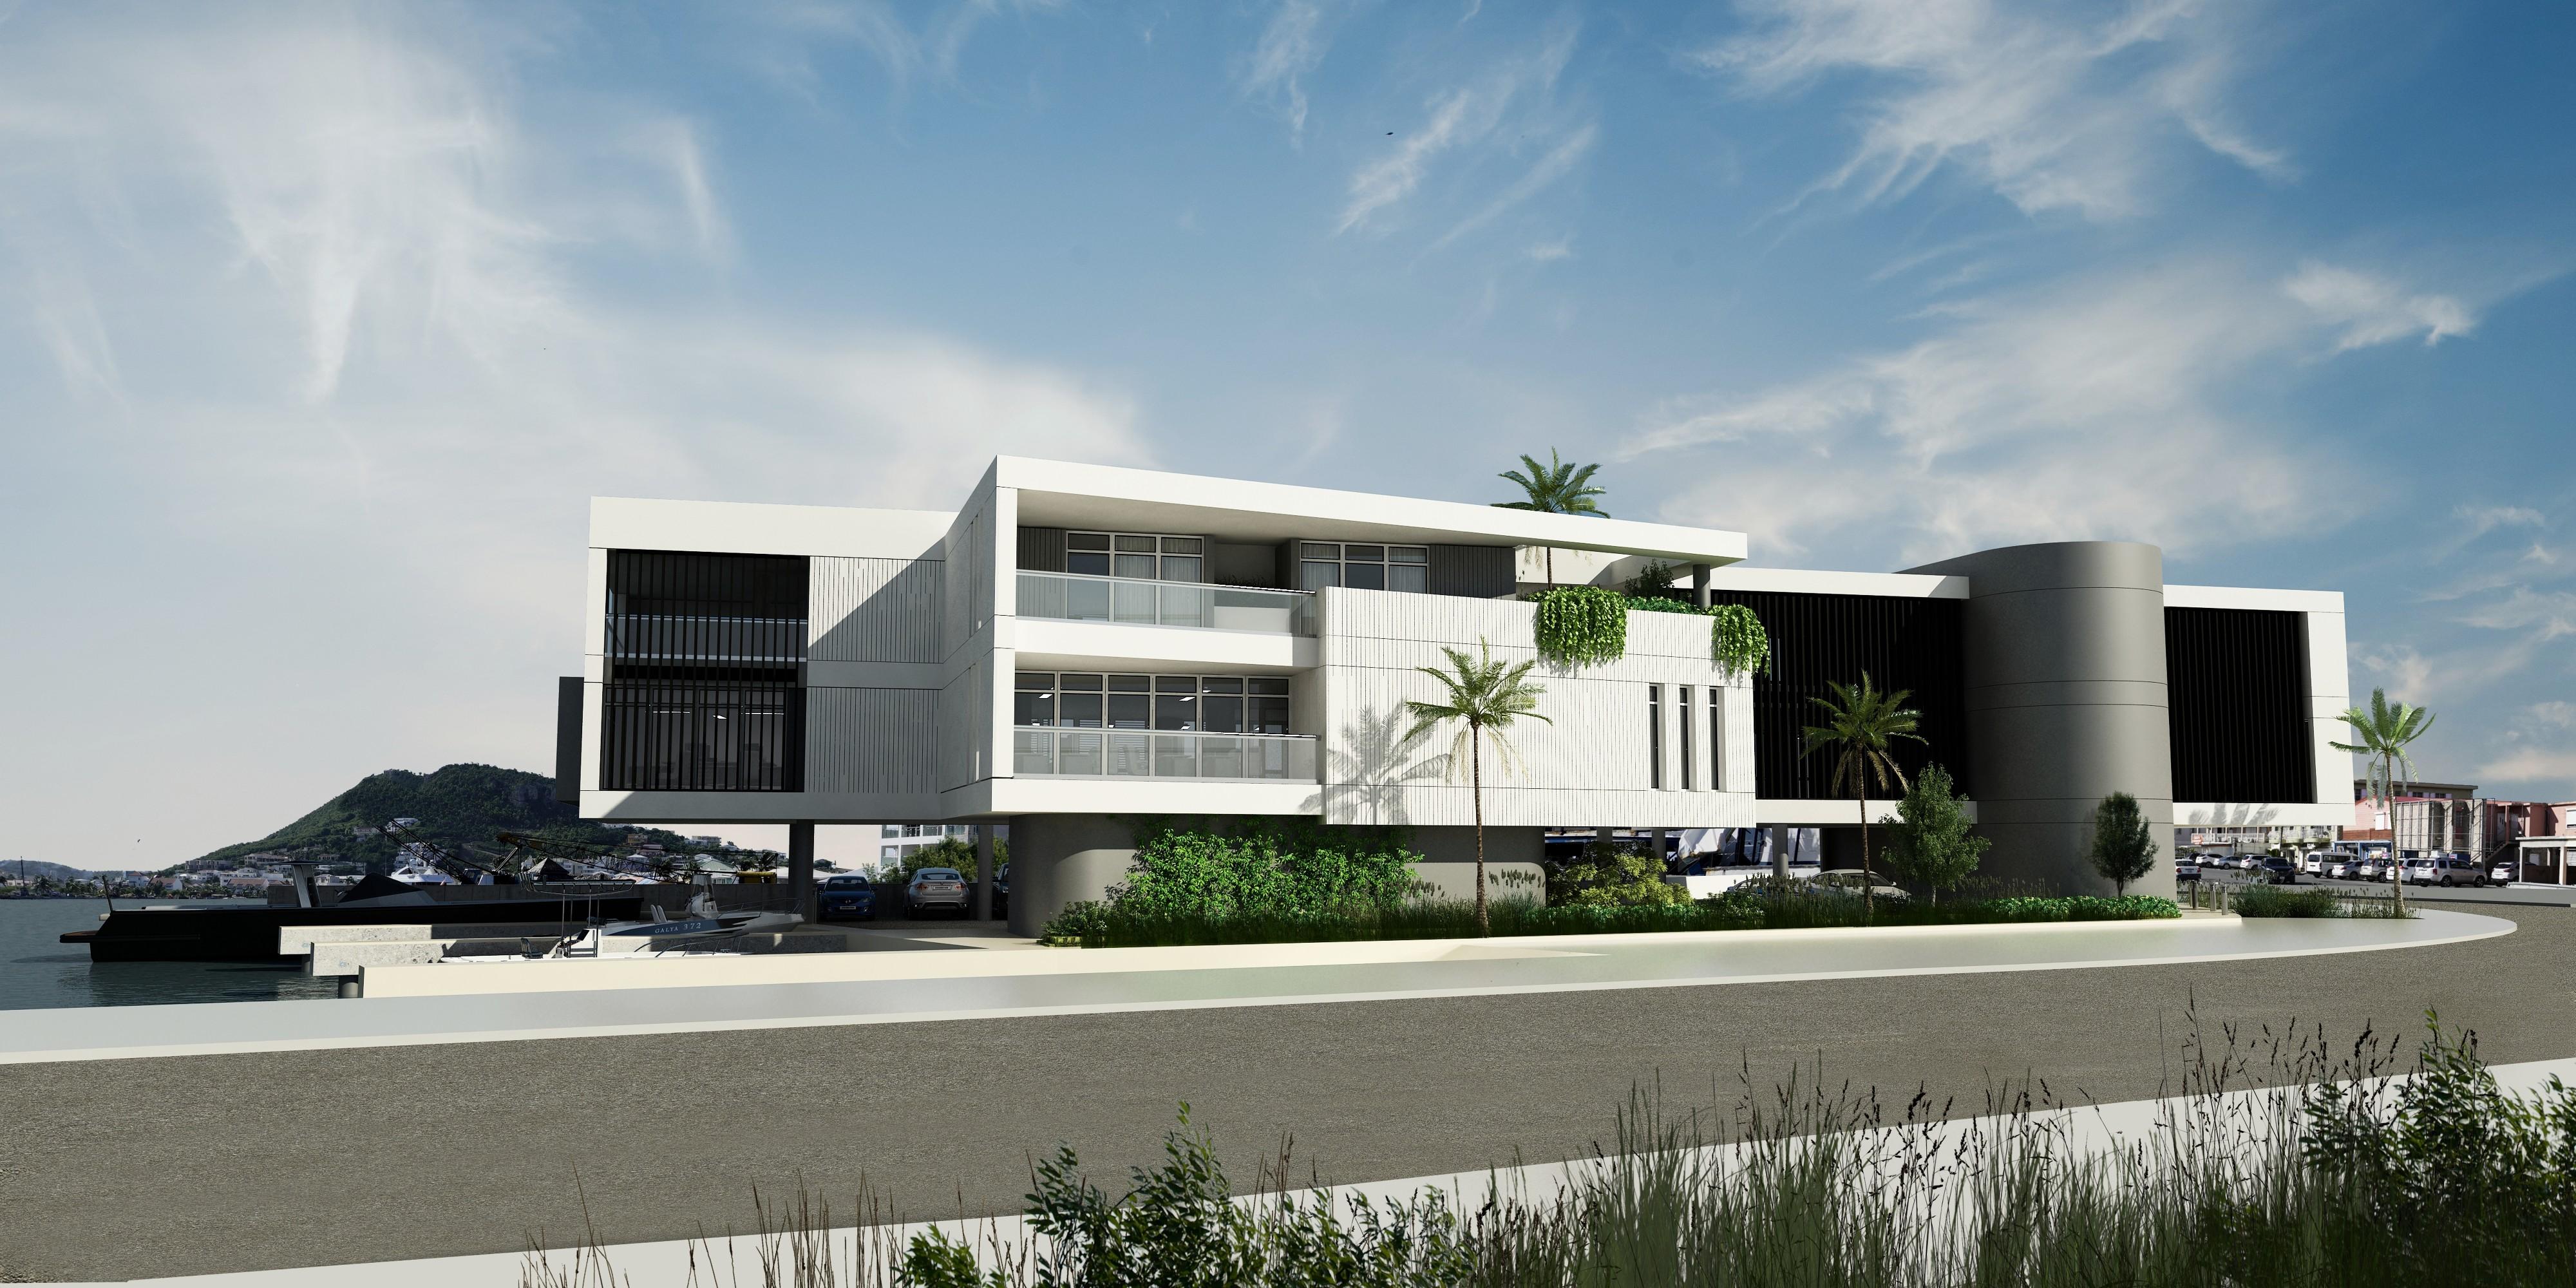 Simpson Bay Commercial & Residential Building - 9f1b4-5-.1render.jpg